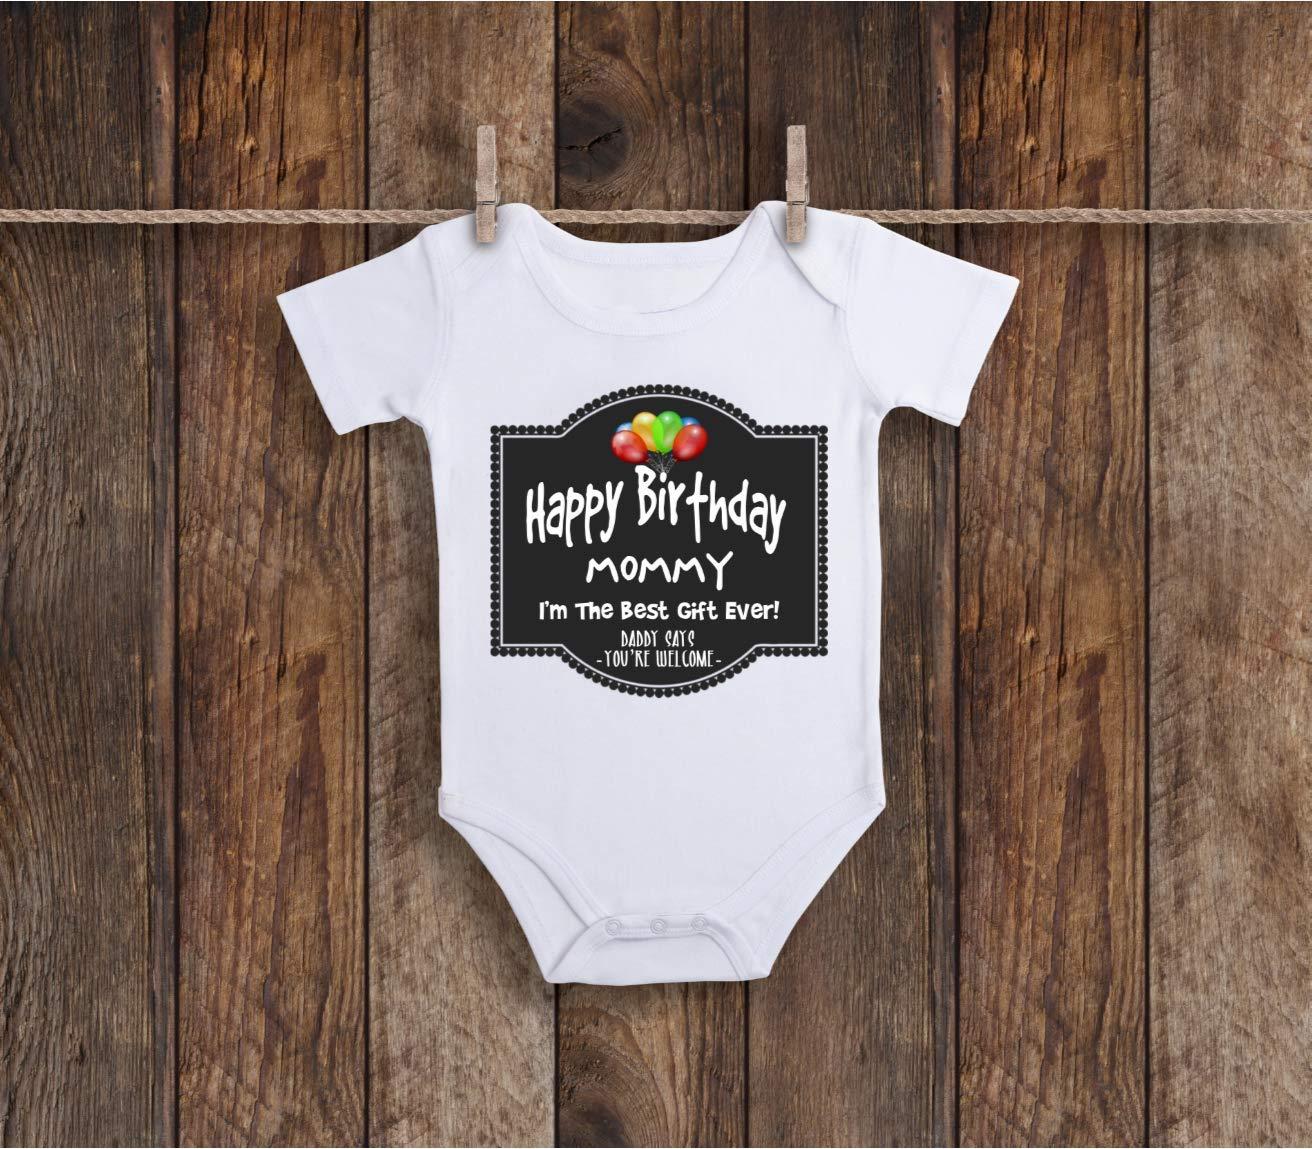 Amazon Funny Happy Birthday Mommy Baby Bodysuit For Sassy Sarcastic Farm Animals Lover Zoo Handmade